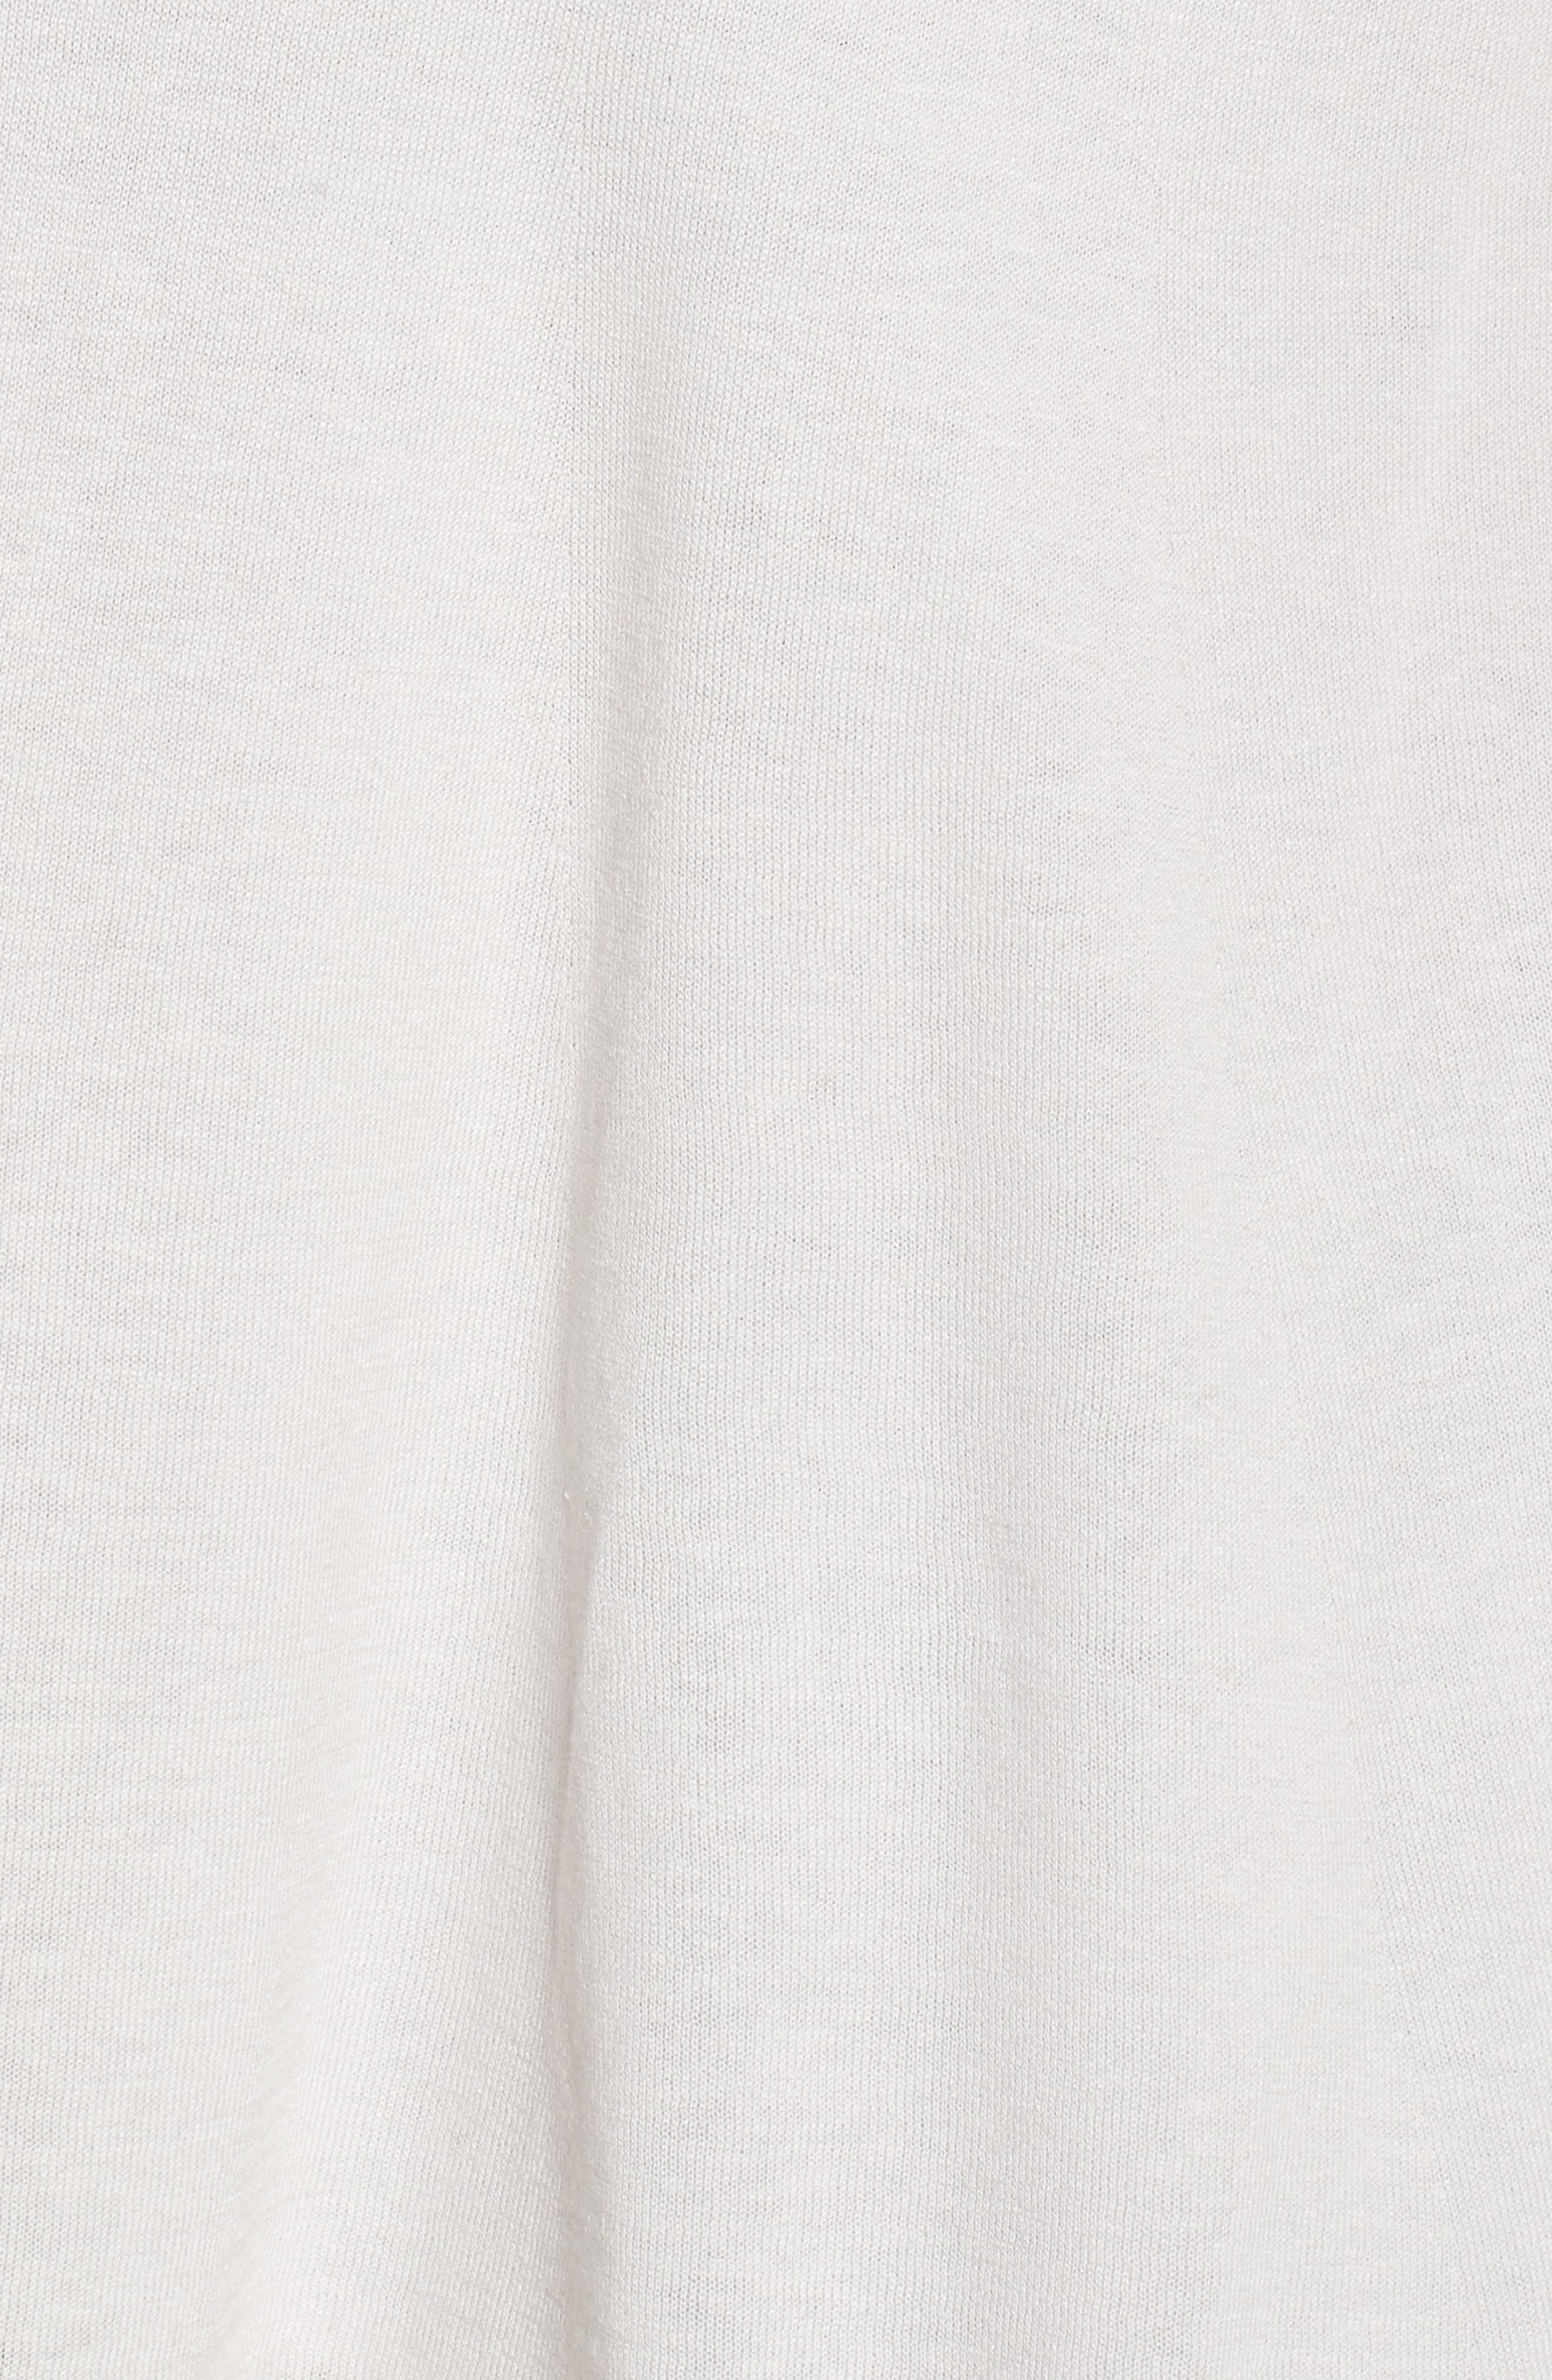 Silk & Organic Linen Long Cardigan,                             Alternate thumbnail 5, color,                             Bone